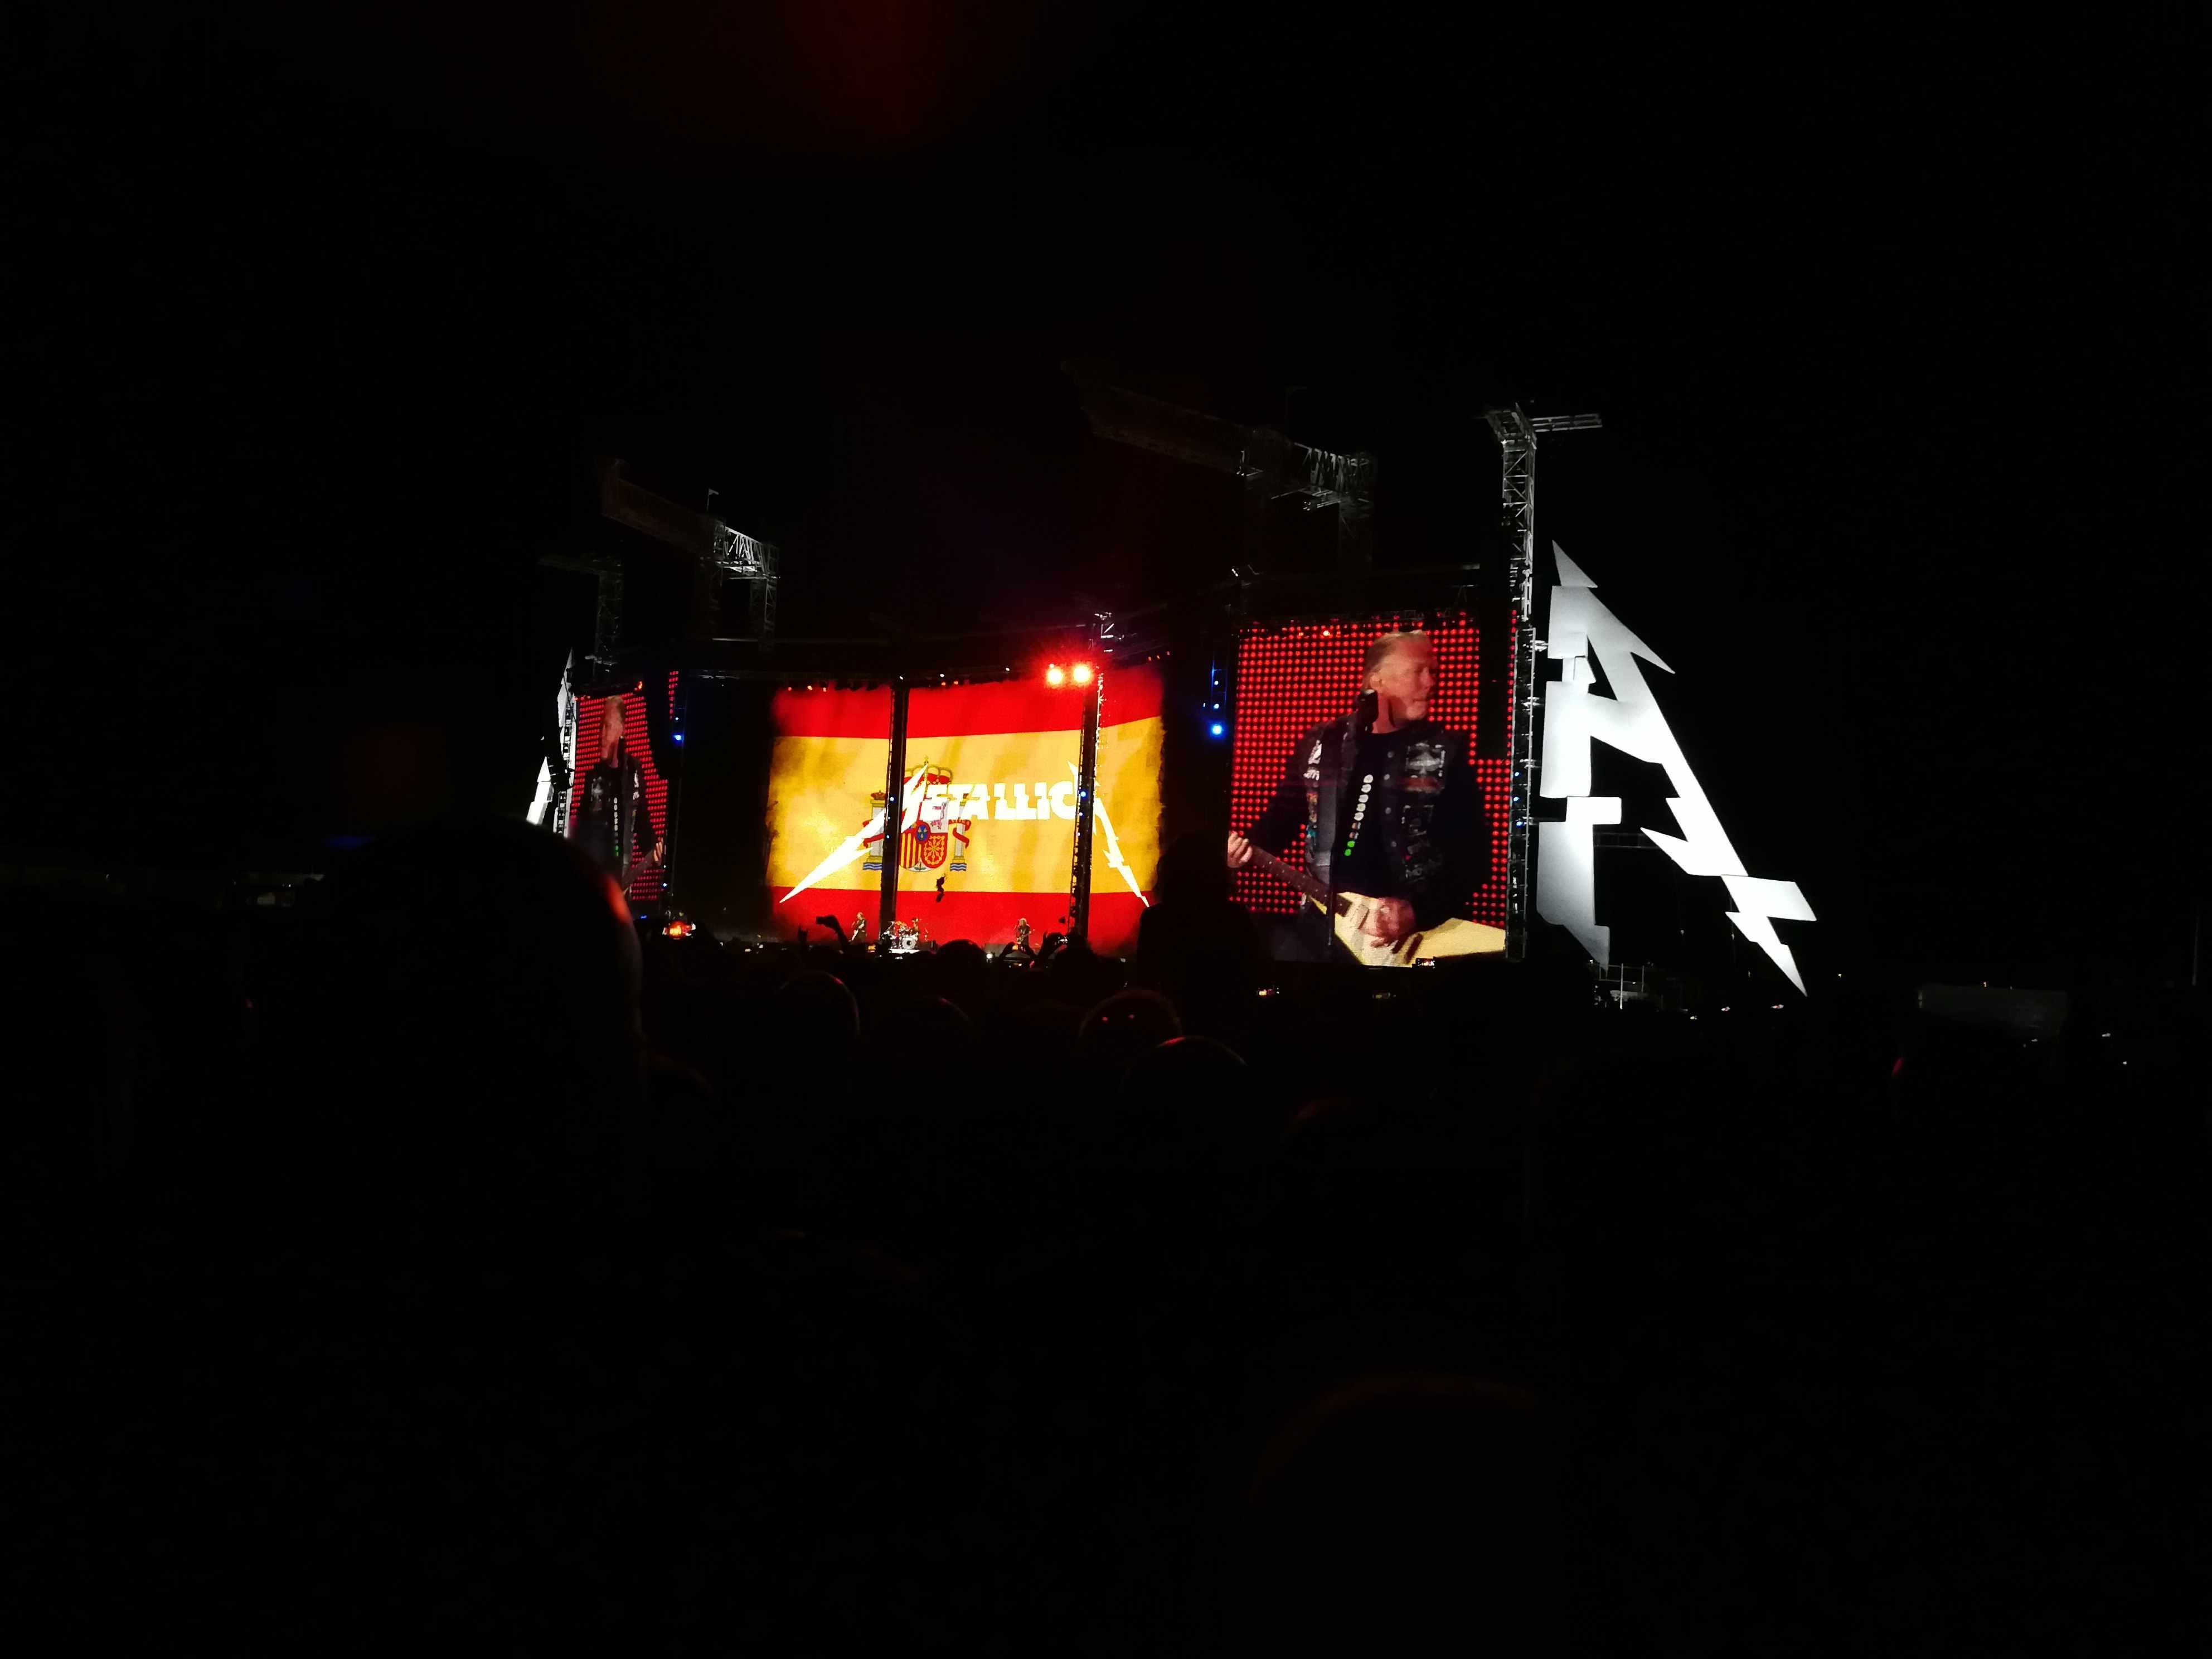 "Metallica eleva el metal a la enésima potencia en un repleto Valdebebas<span class=""wtr-time-wrap after-title""><span class=""wtr-time-number"">21</span> minutos de lectura</span>"